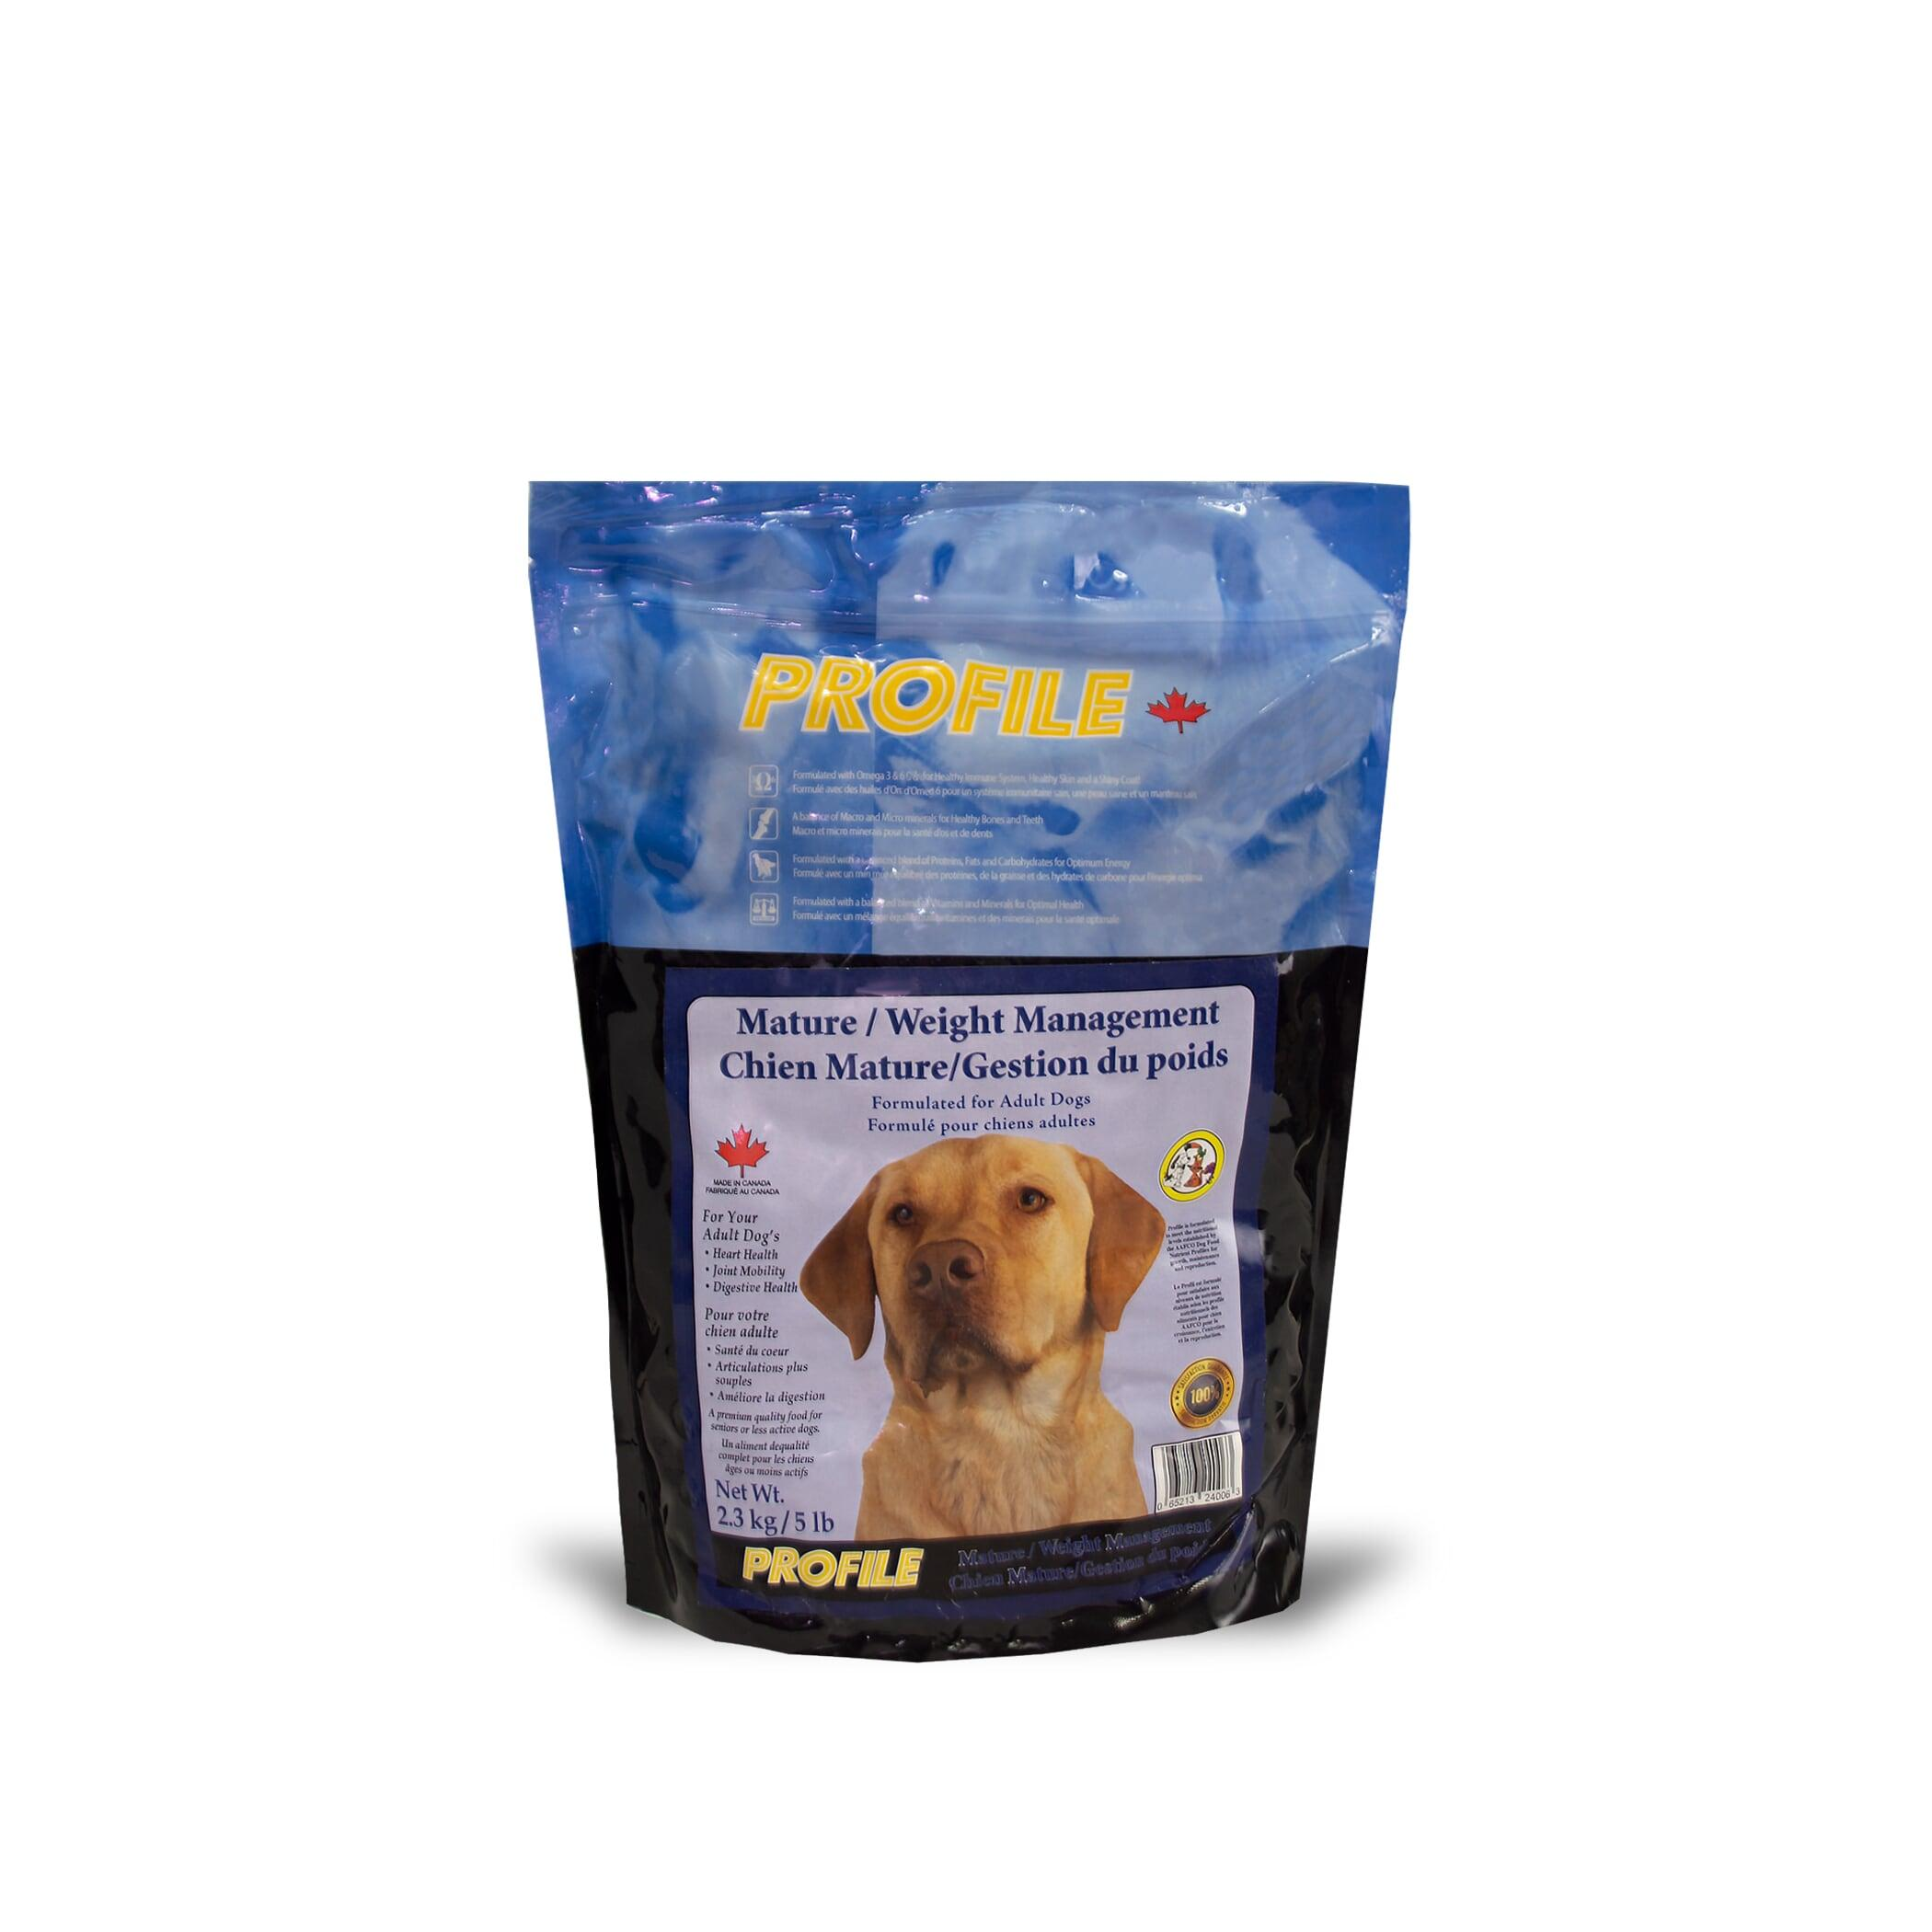 Profile Mature/Weight Management Dry Dog Food Image